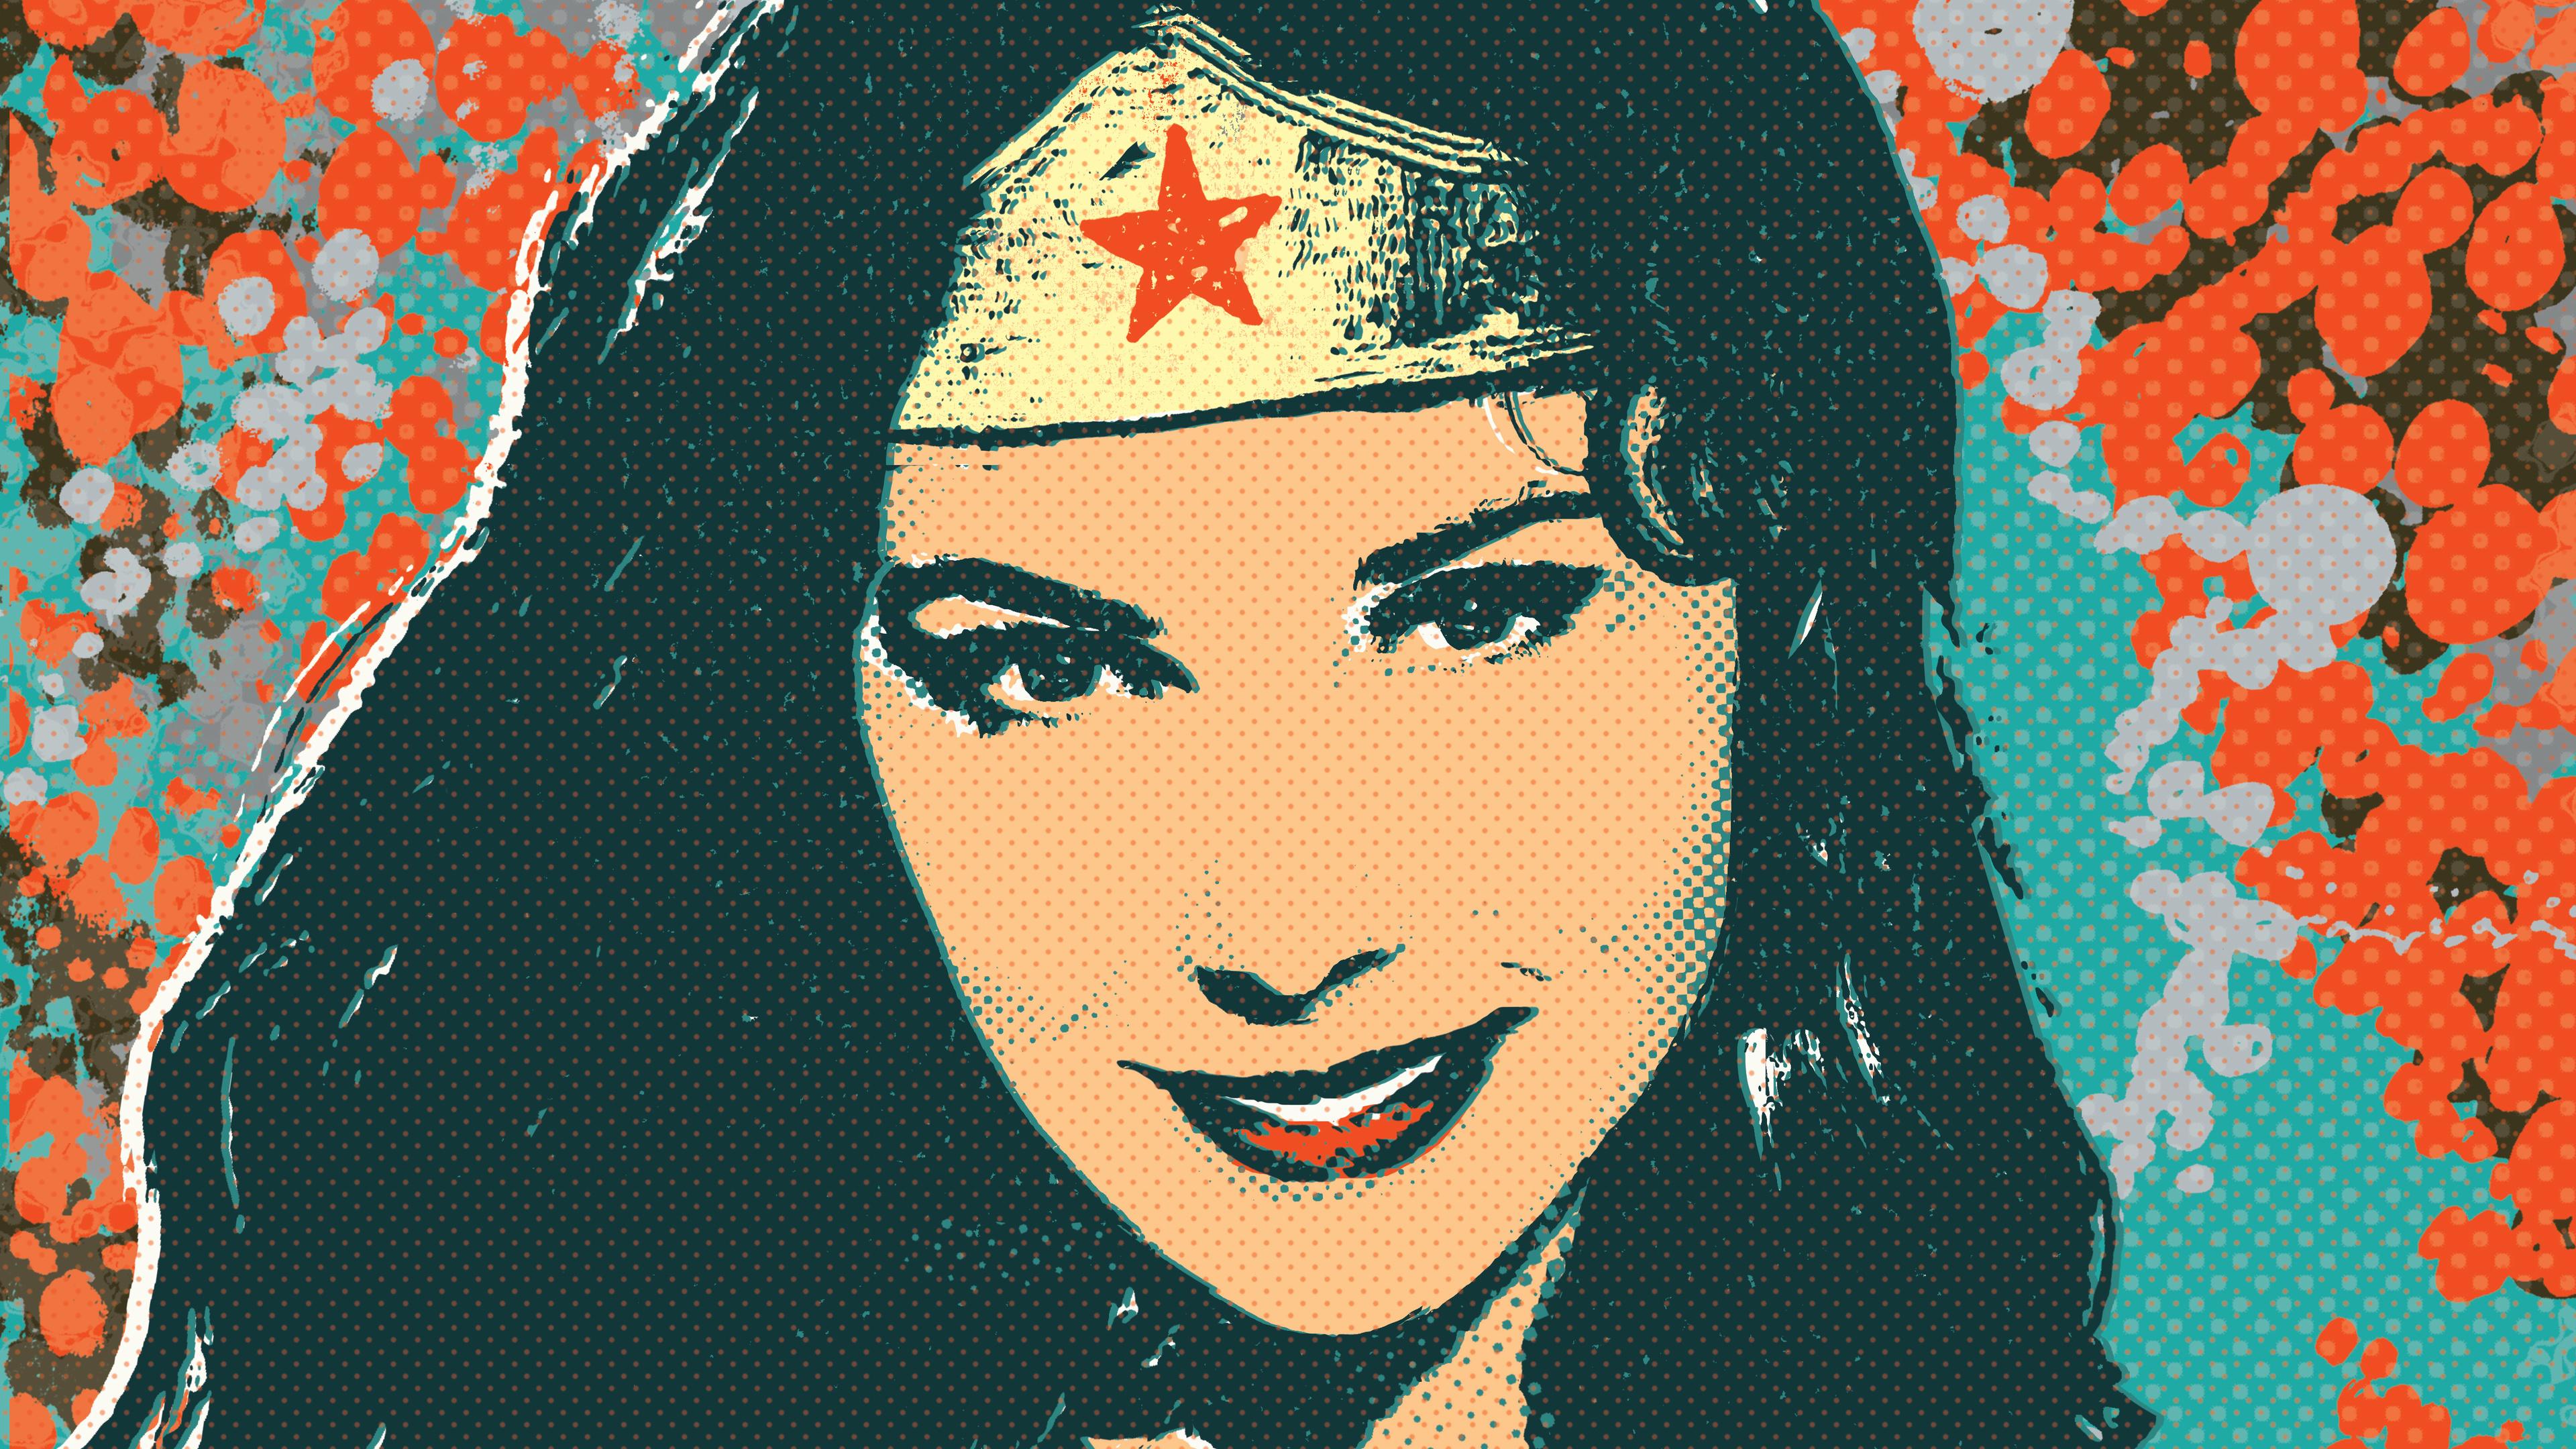 wonder woman illustration 4k 1544286760 - Wonder Woman Illustration 4k - wonder woman wallpapers, superheroes wallpapers, illustration wallpapers, hd-wallpapers, digital art wallpapers, artwork wallpapers, artist wallpapers, 4k-wallpapers